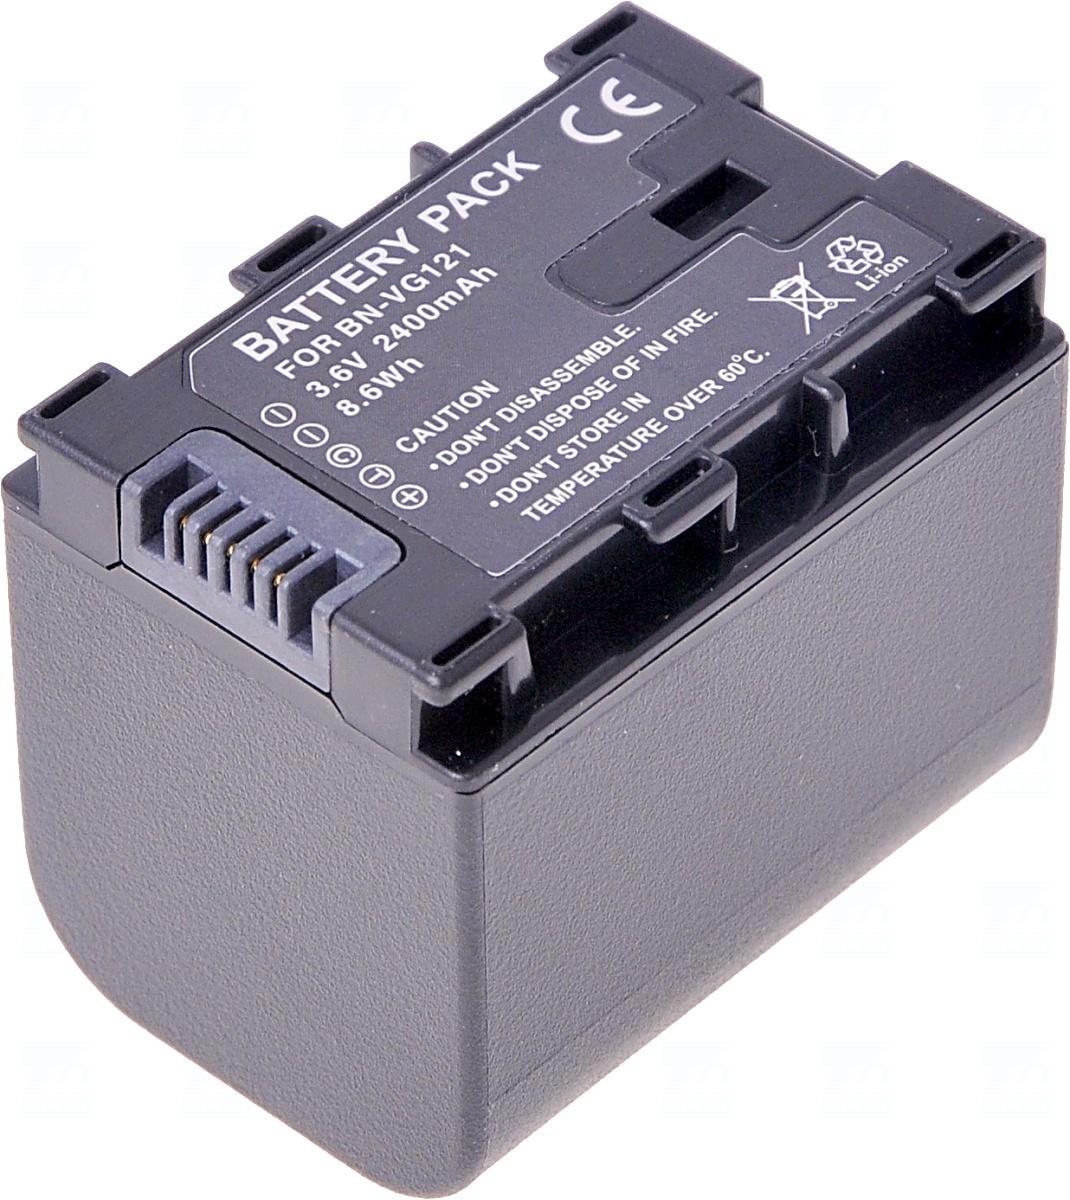 T6 power Baterie T6 power BN-VG121, BN-VG114, BN-VG107, BN-VG121